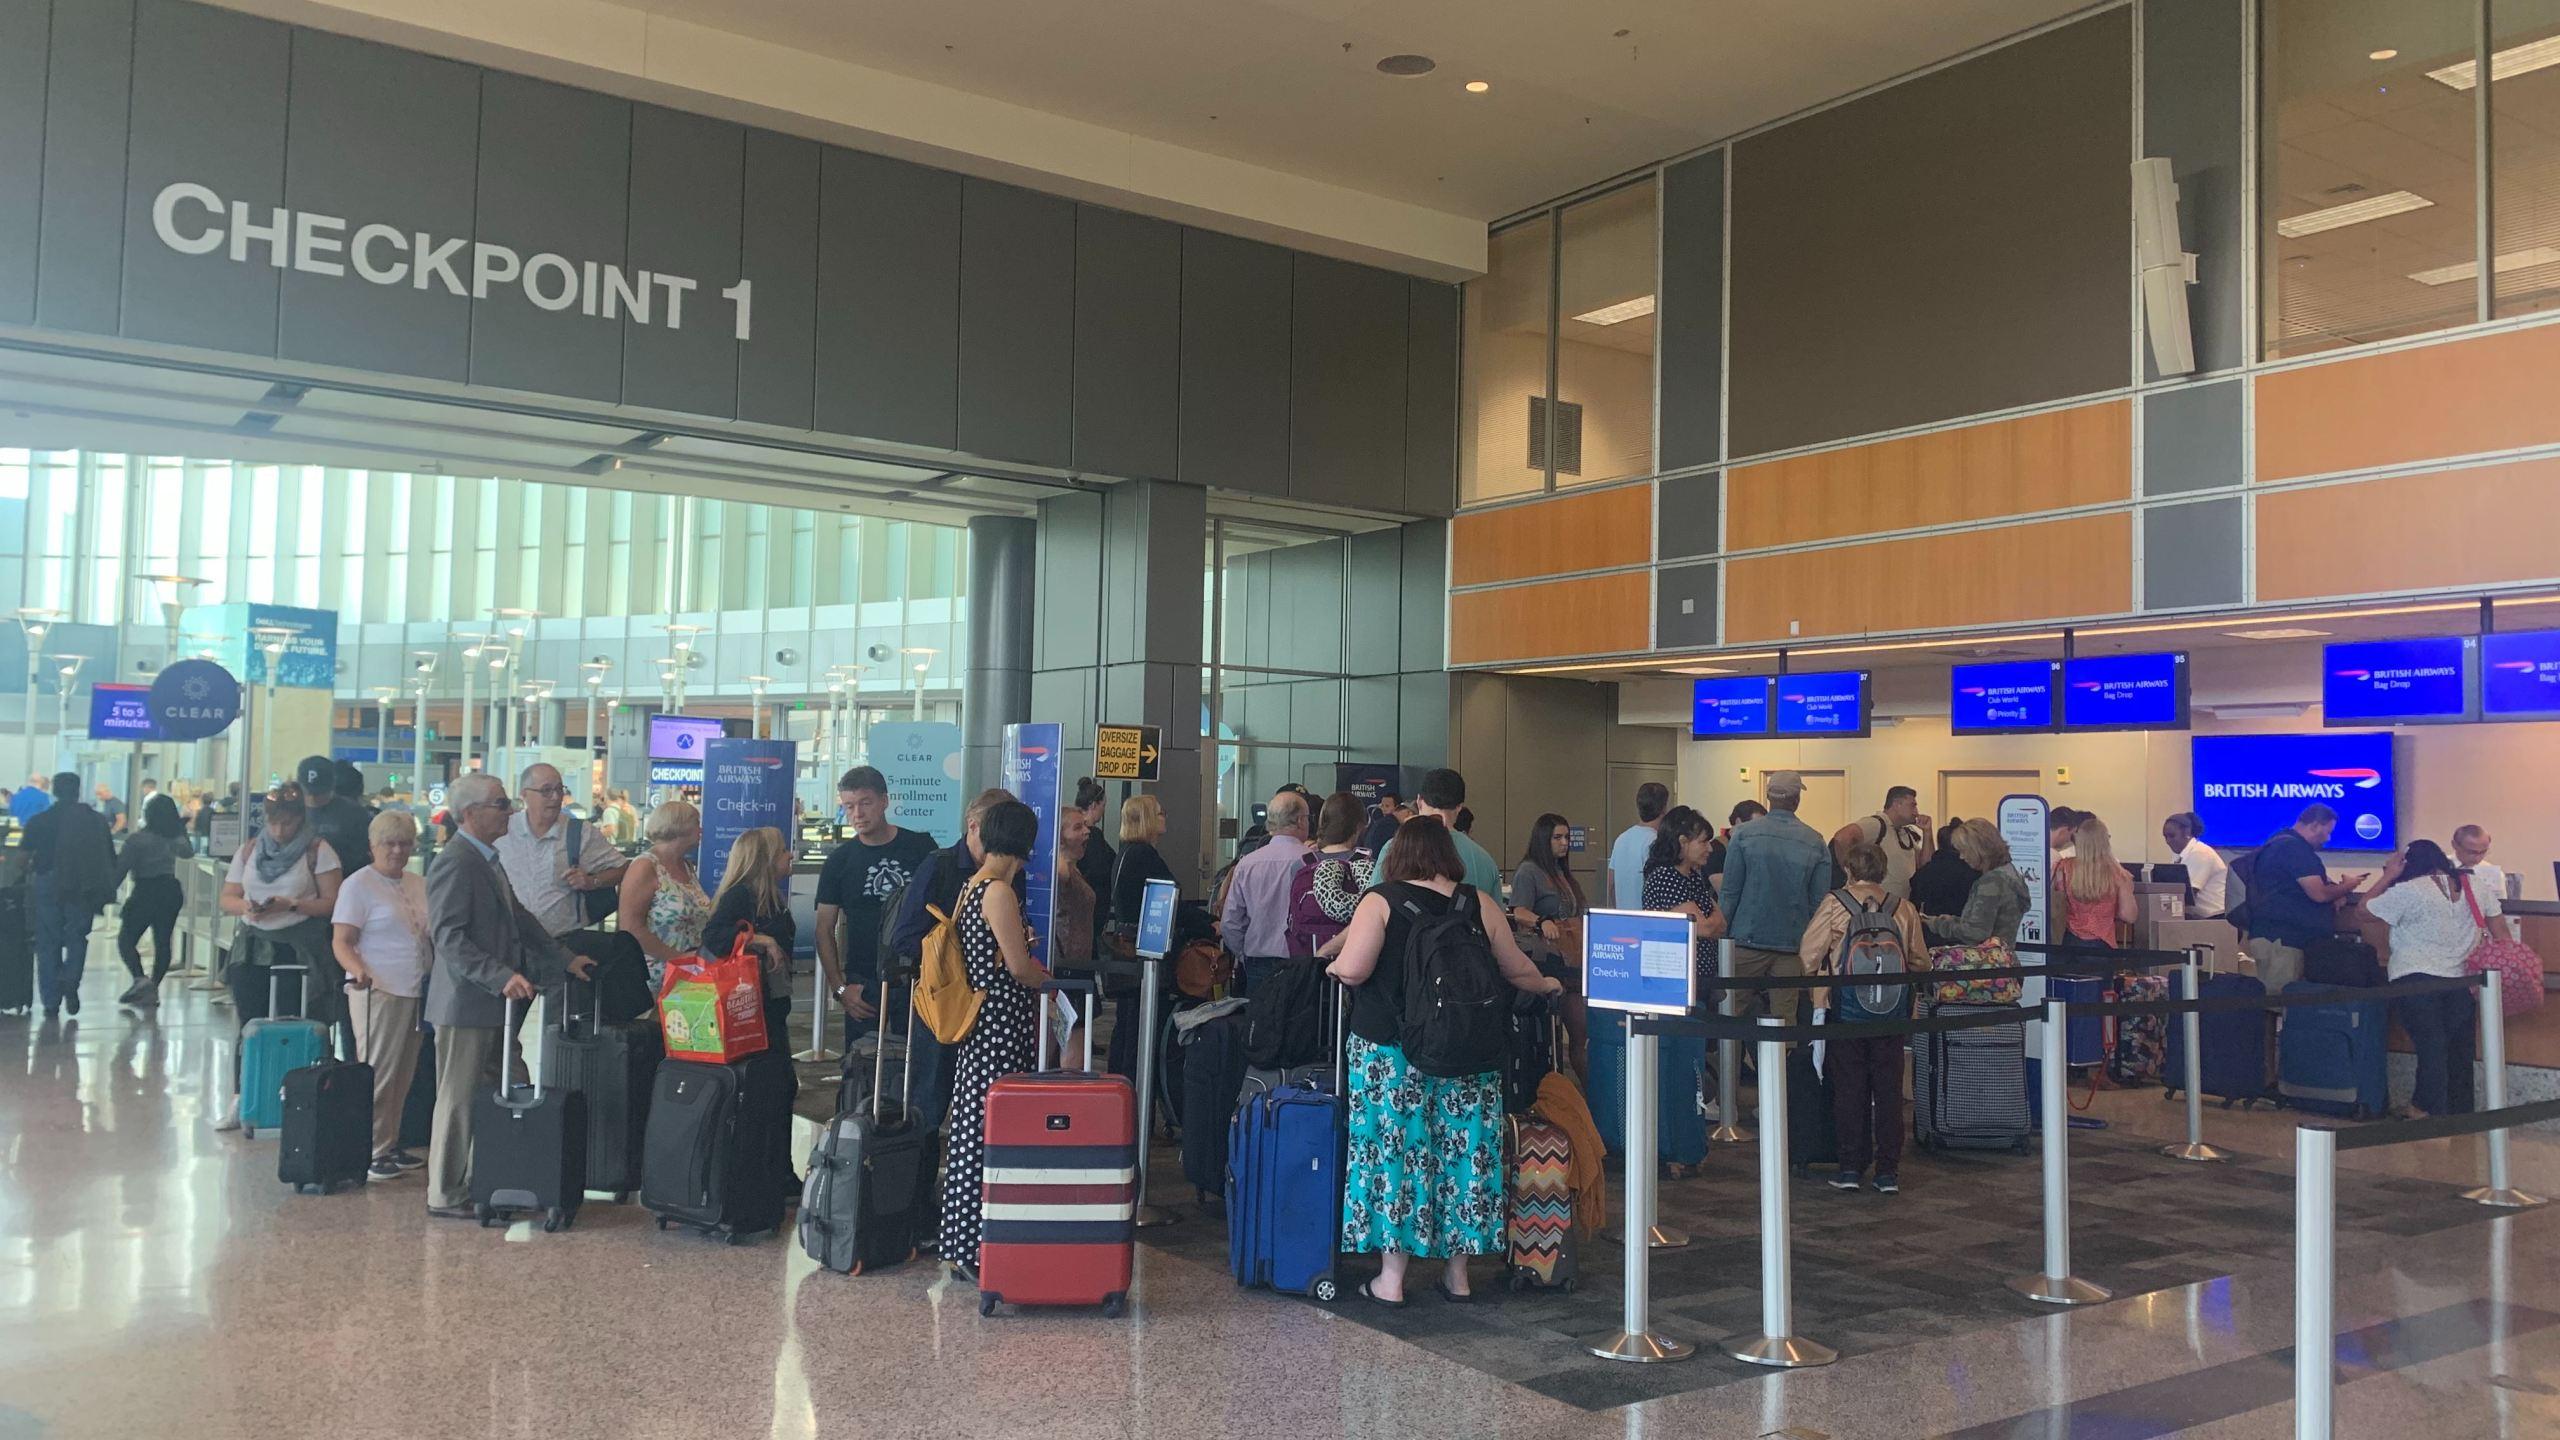 austin airport wait times